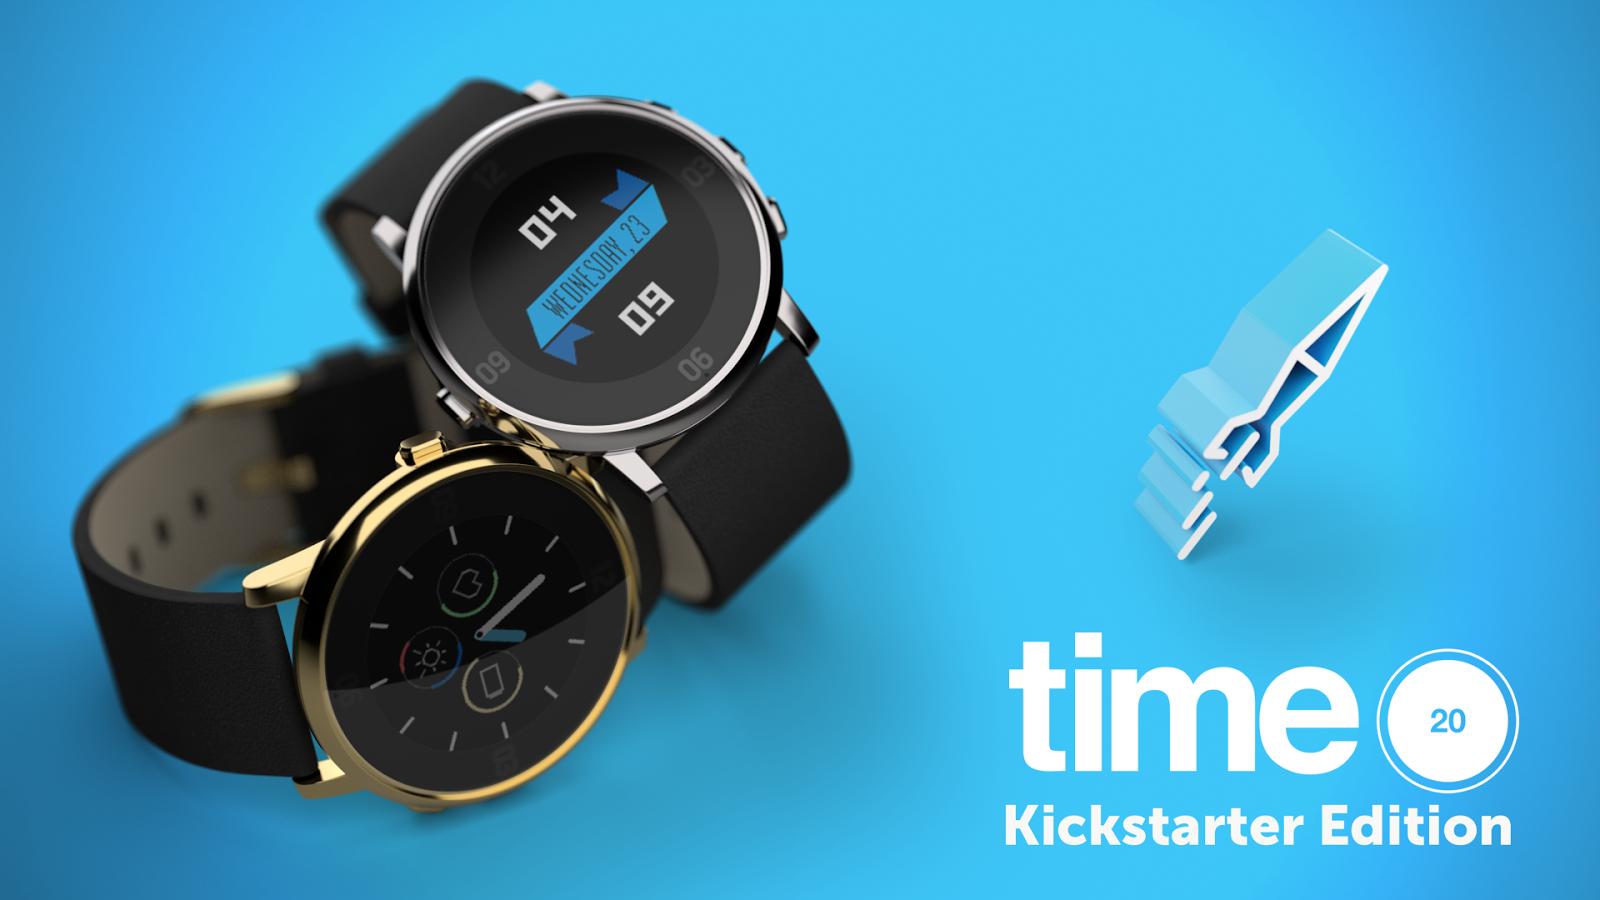 Pebble Time Round Kickstarter